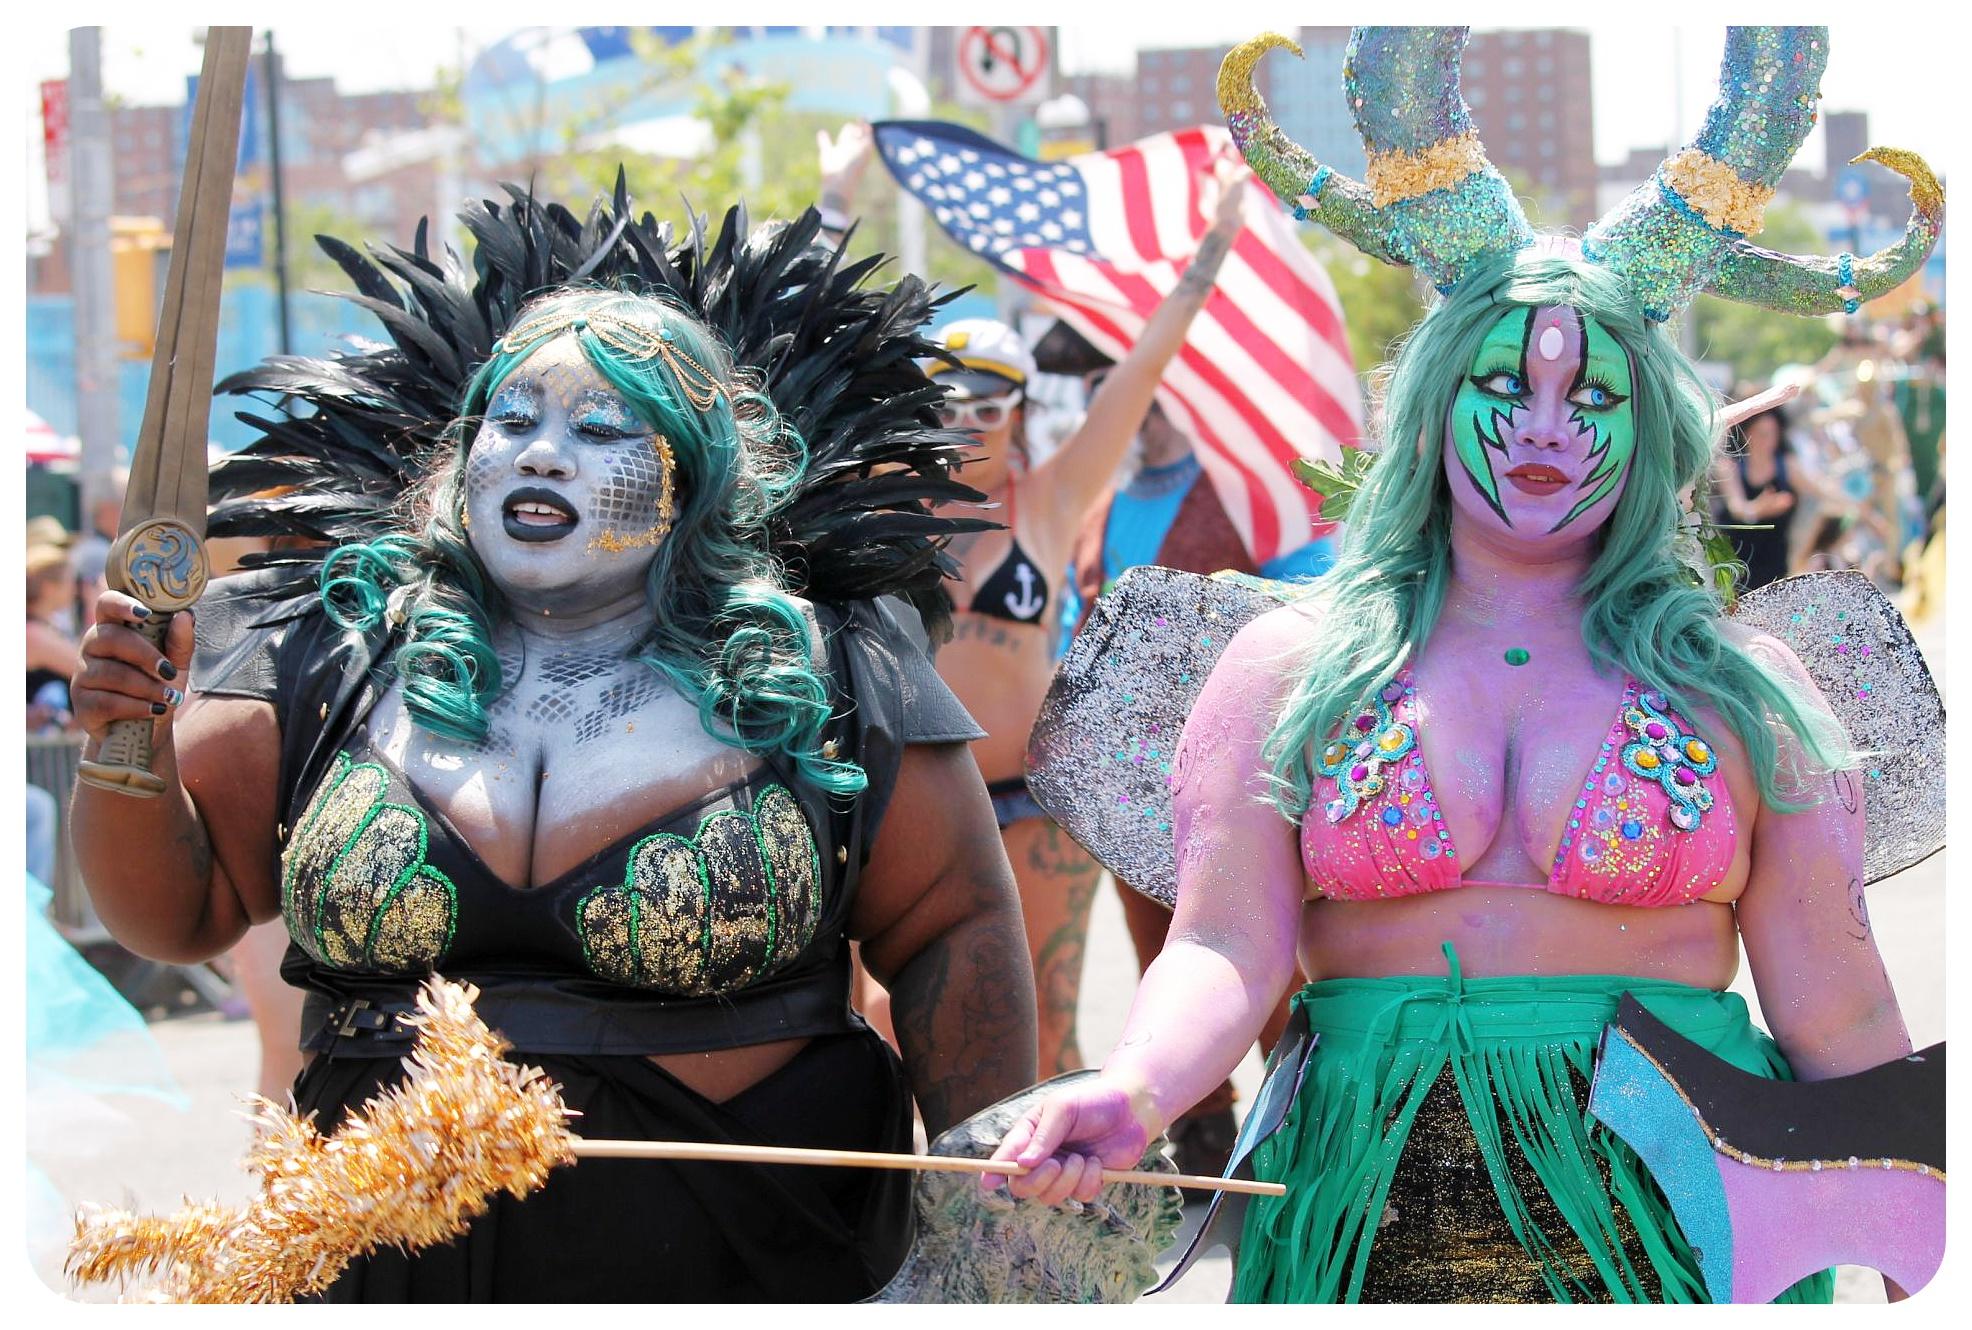 coney island mermaid parade 2014 girls